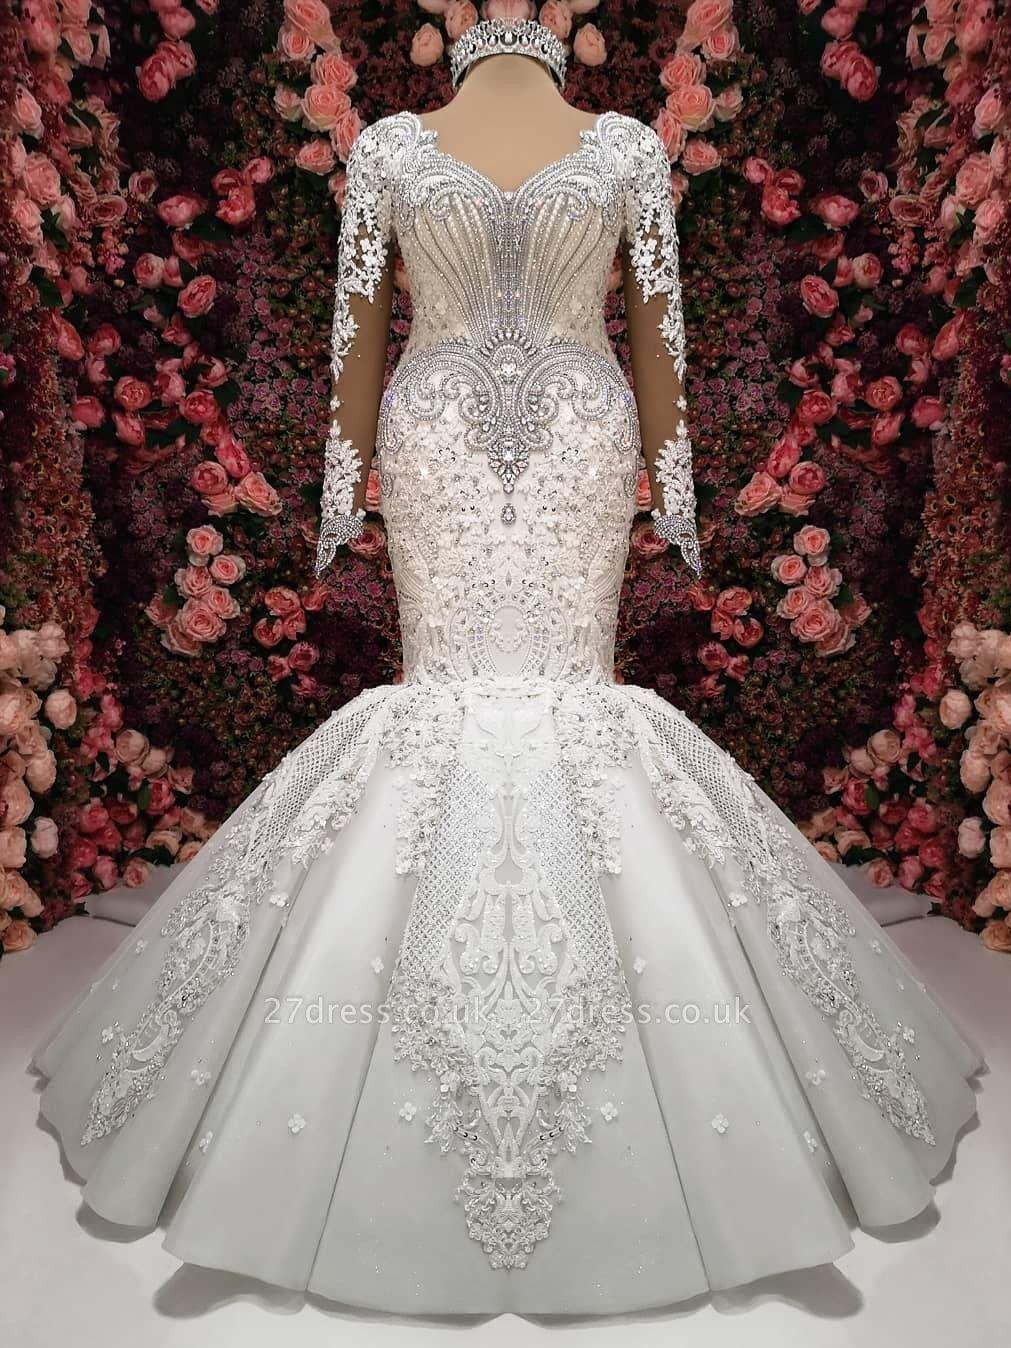 Glamorous Crystals Sexy Mermaid Bridal Gowns Long Sleeves  Wedding Dresses UK